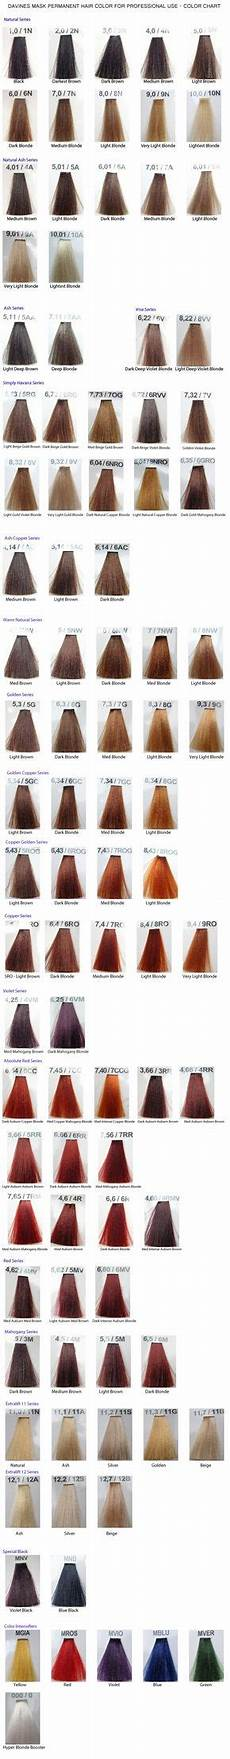 Davines Mask Colour Chart Davines Mask Color Chart Color Chart Colored Hair Tips